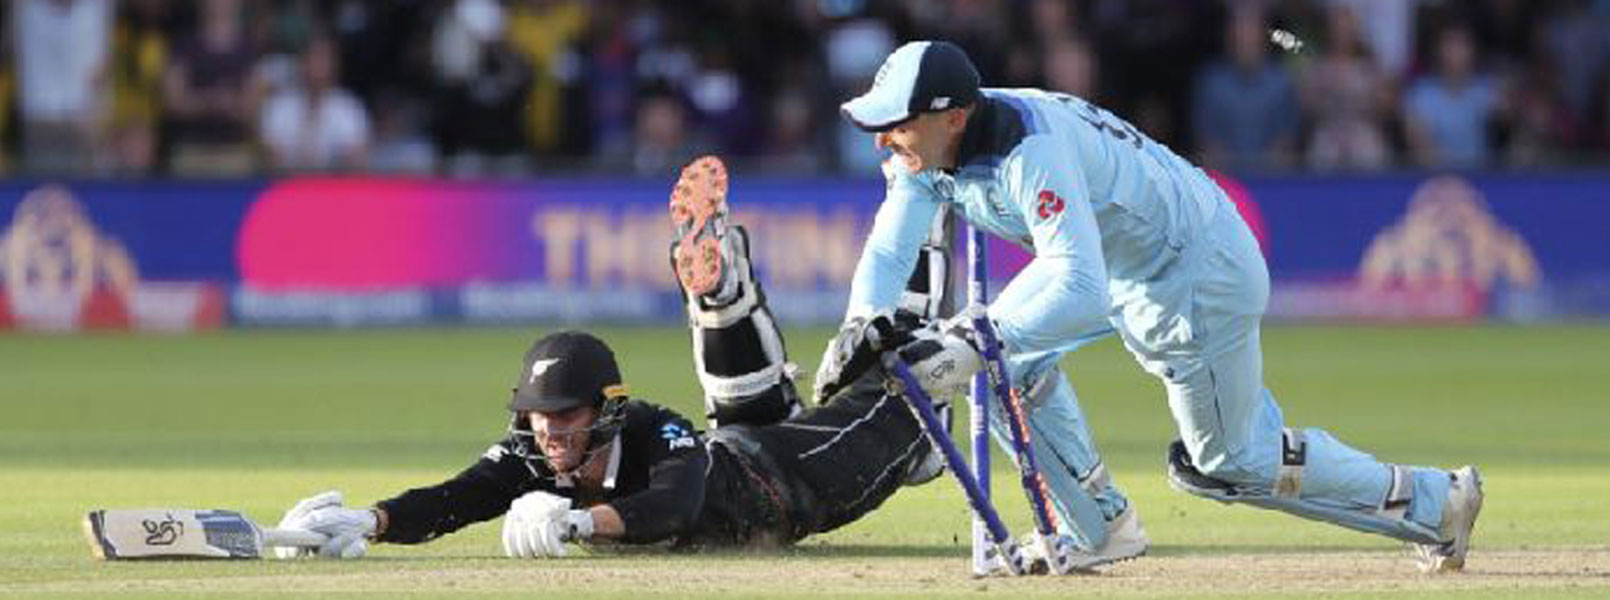 Cricket_W.jpg